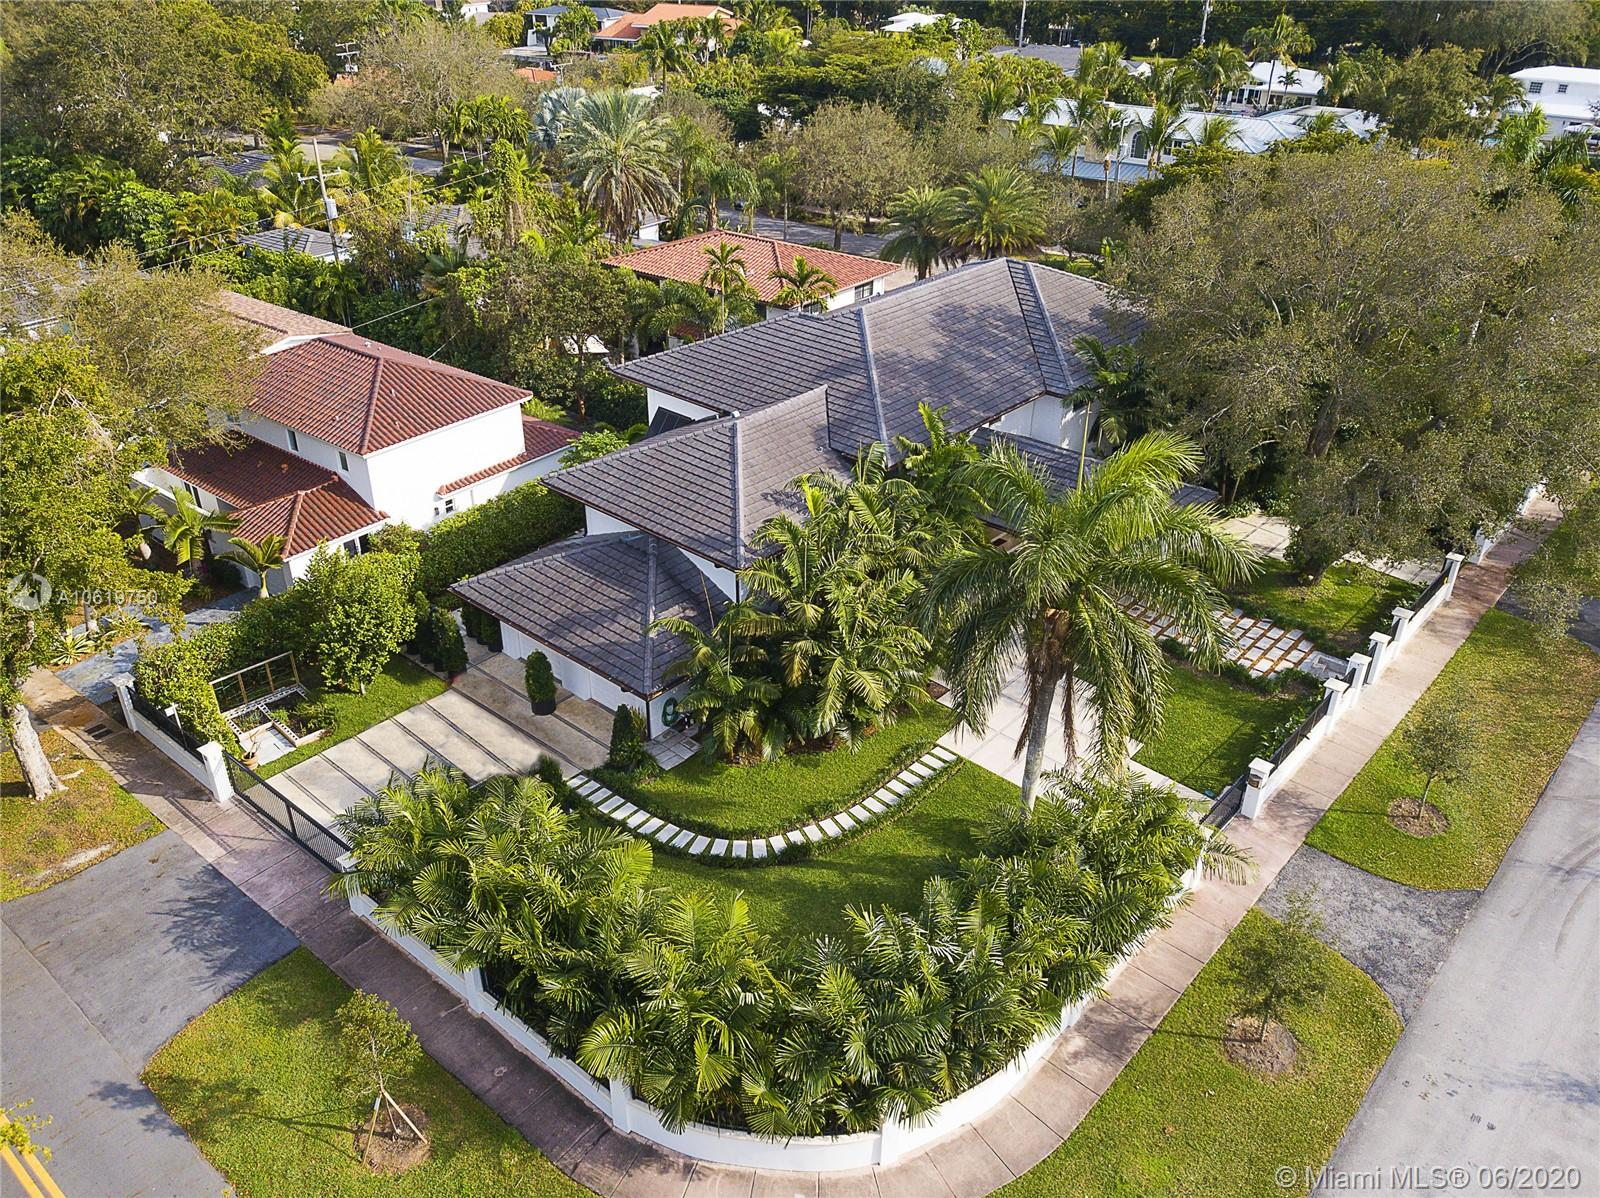 South Miami - 6611 Leonardo St, Coral Gables, FL 33146